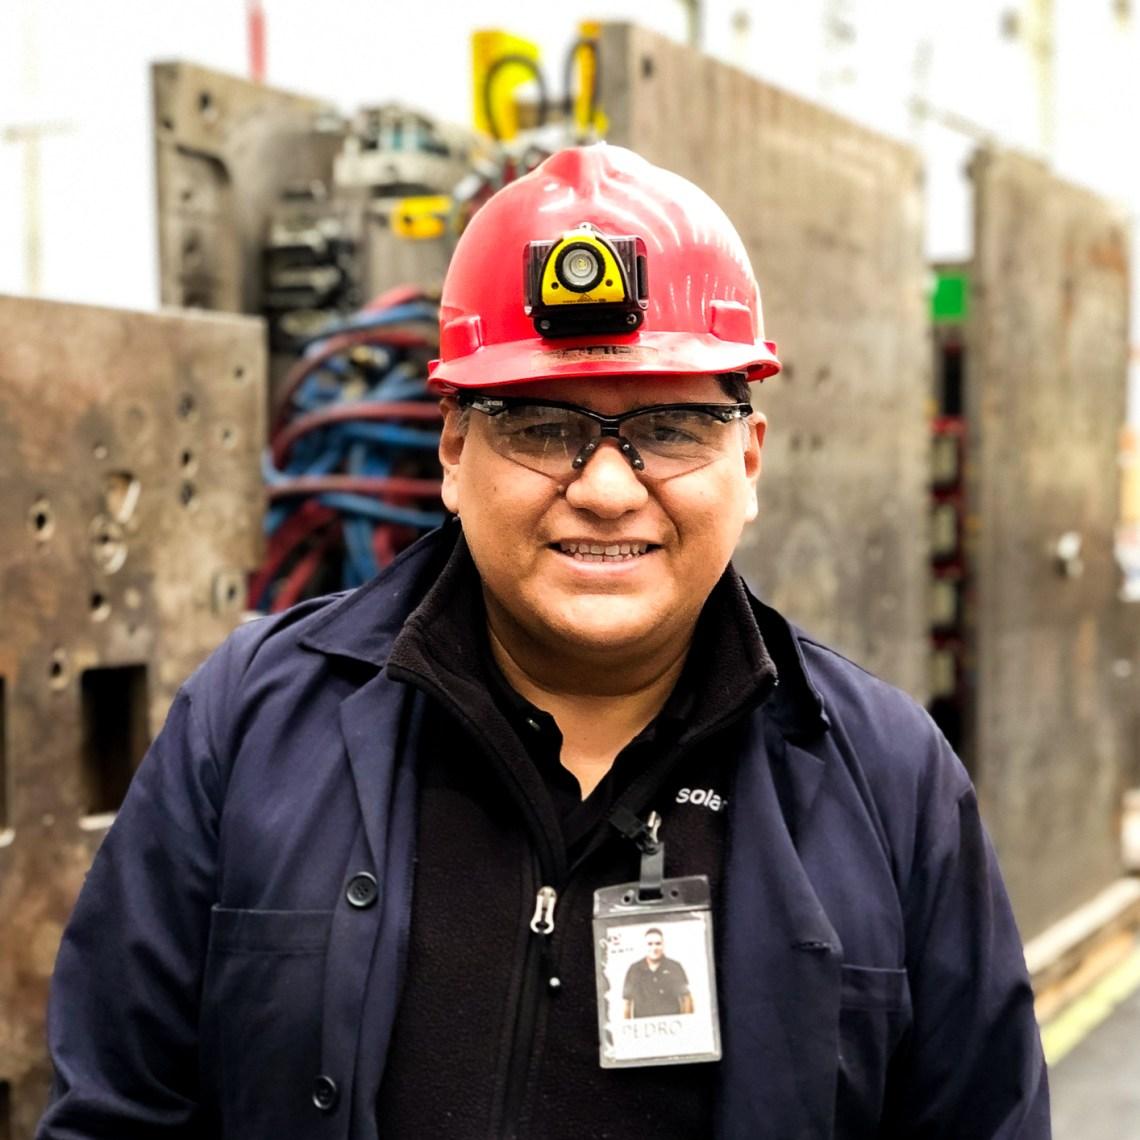 Pedro García Adapt Plastic Technology